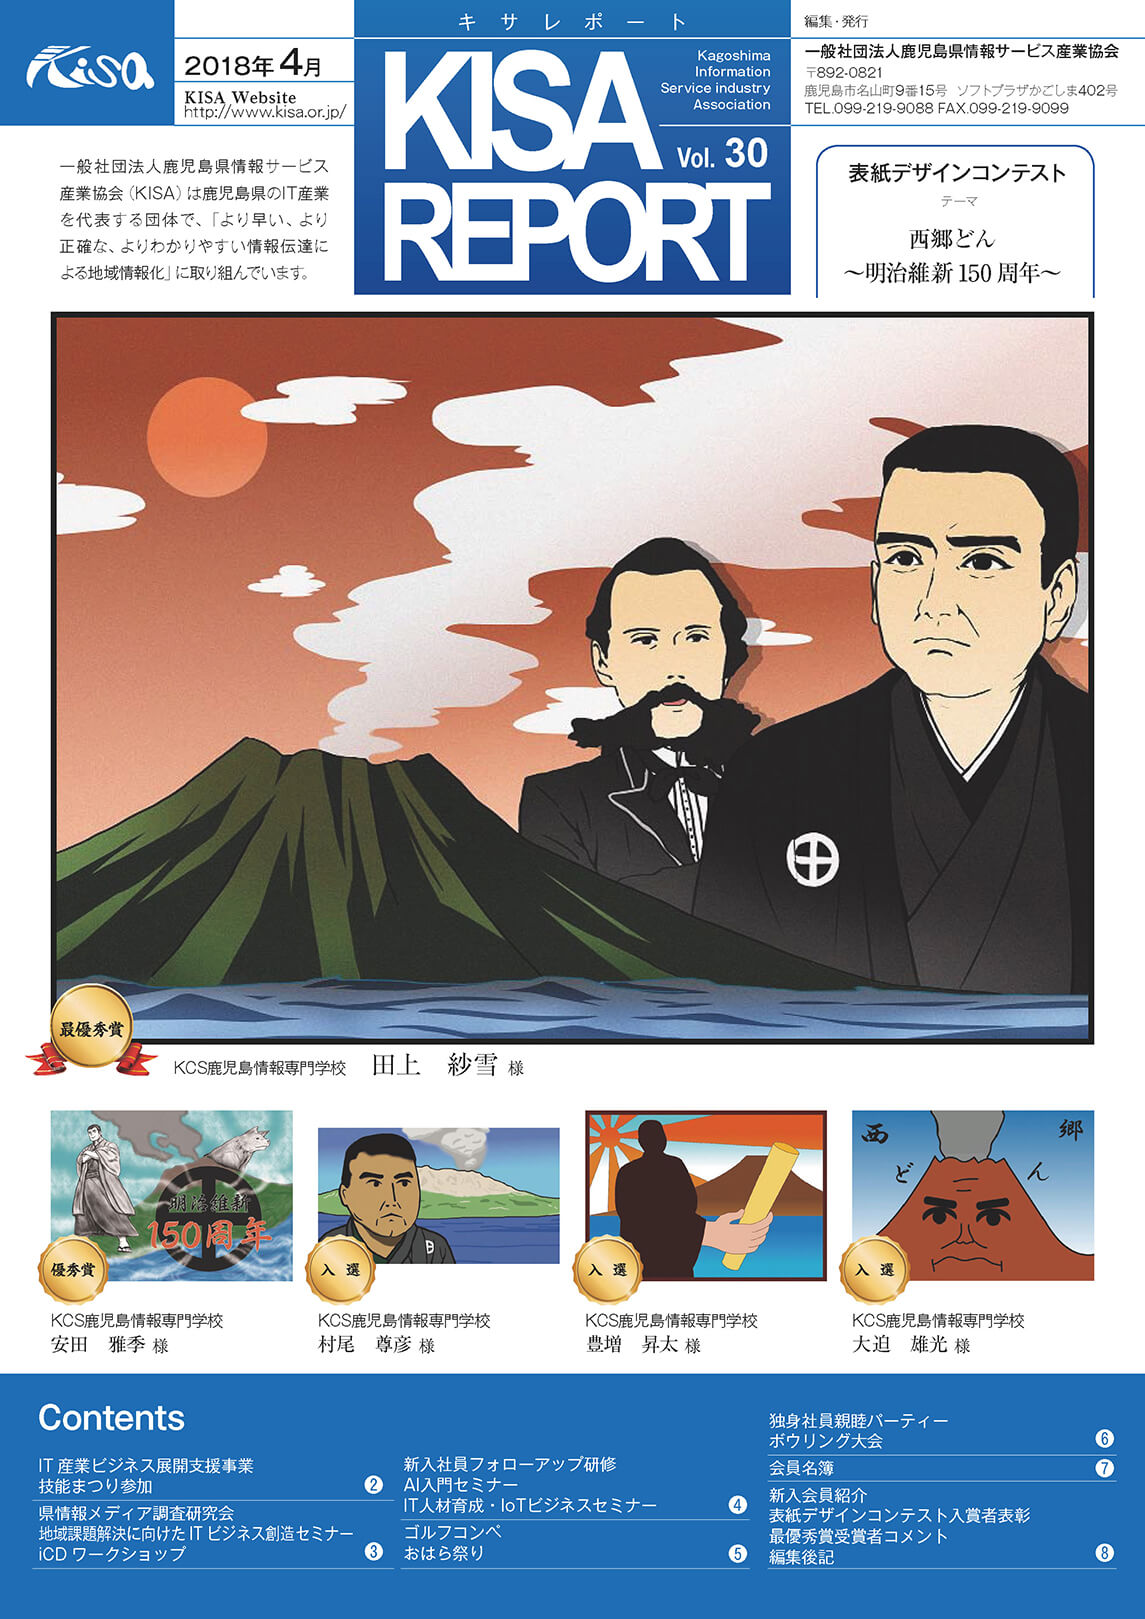 『KISA REPORT Vol.30』発刊しました